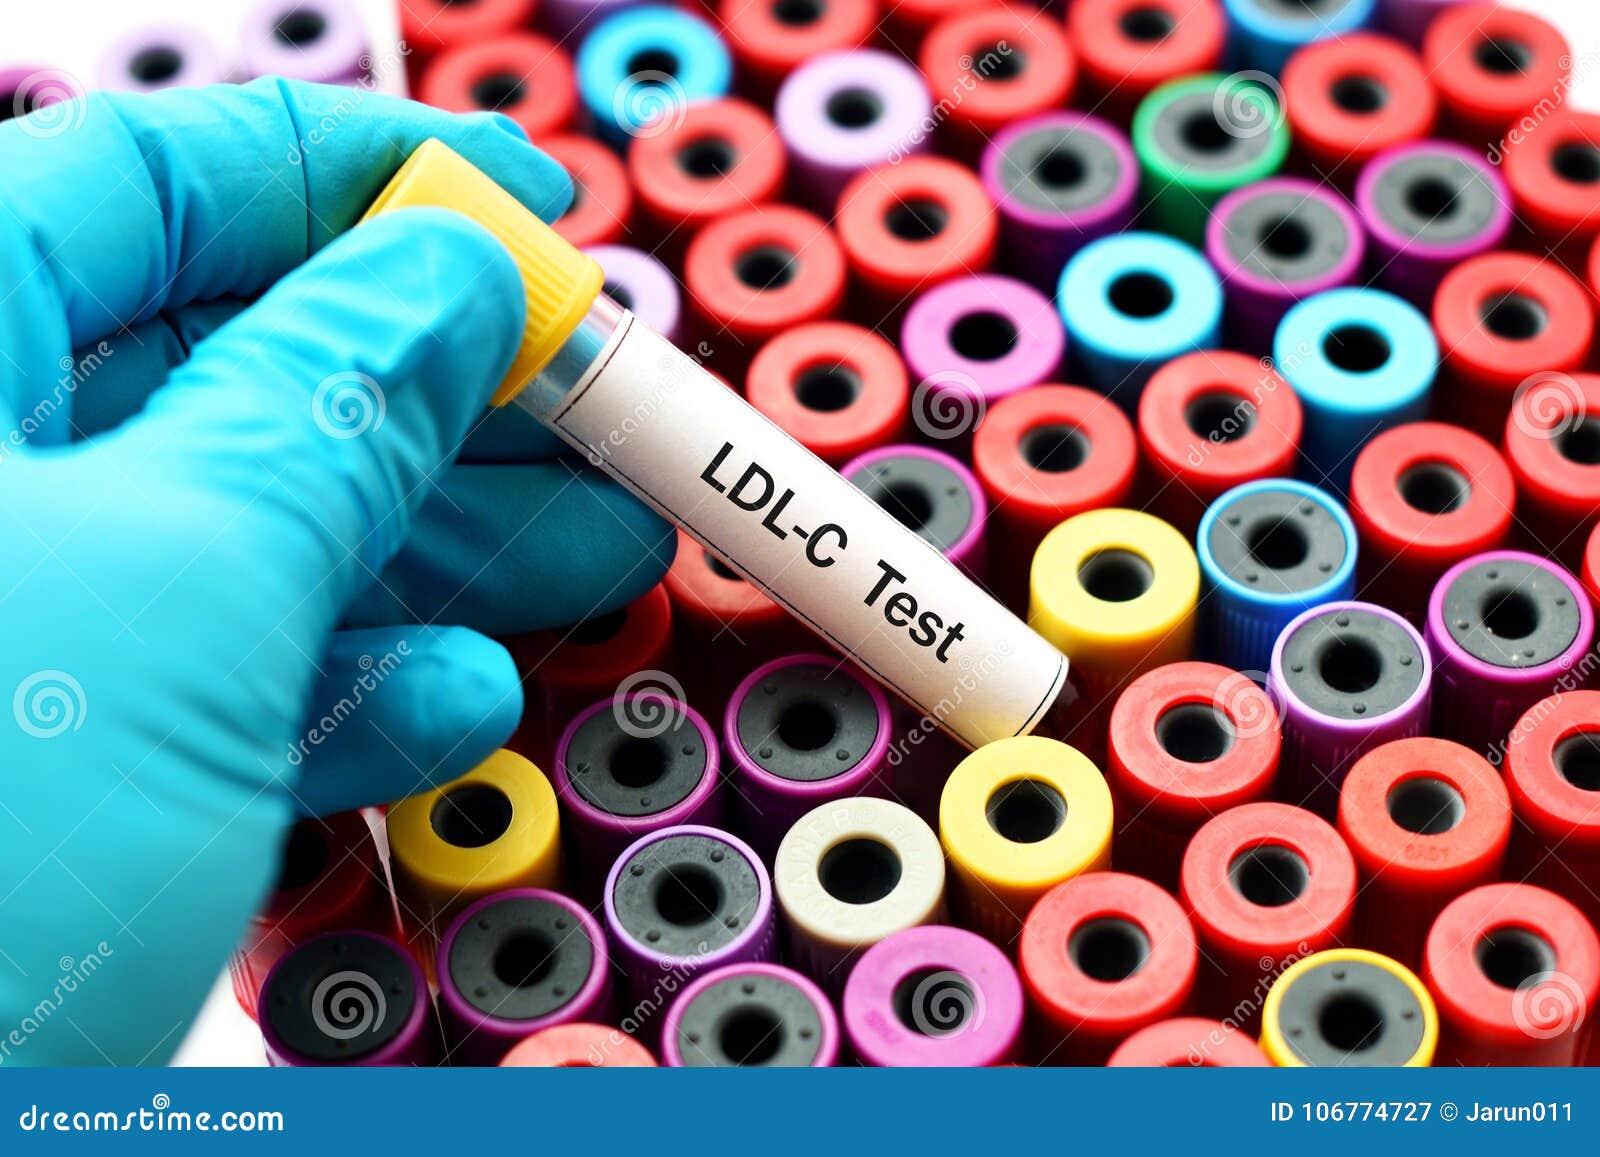 Blood for LDL cholesterol test